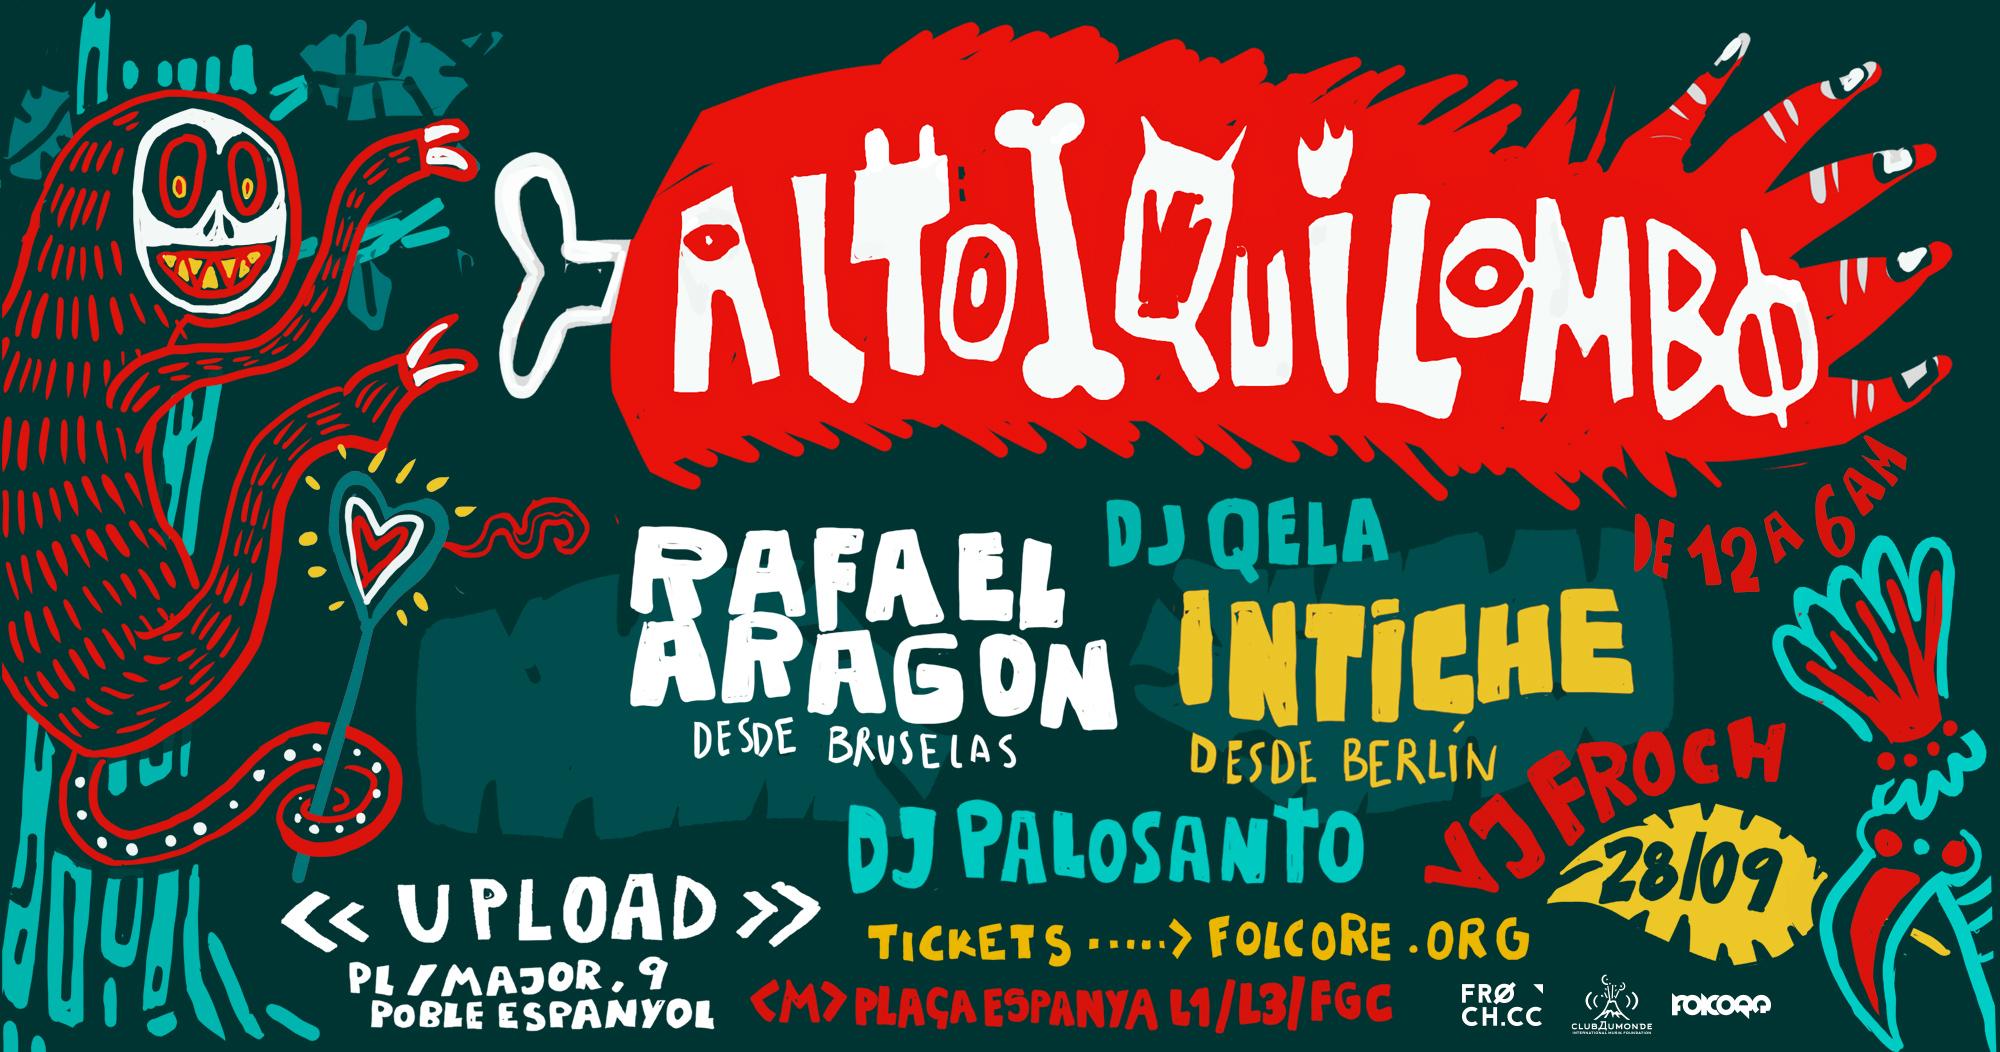 ALTO QUILOMBO · 28 SEPTIEMBRE 2018 · UPLOAD · BARCELONA :: Rafael Aragon - Intiche - DJ QELA - DJ PaloSanto - VJ Froch